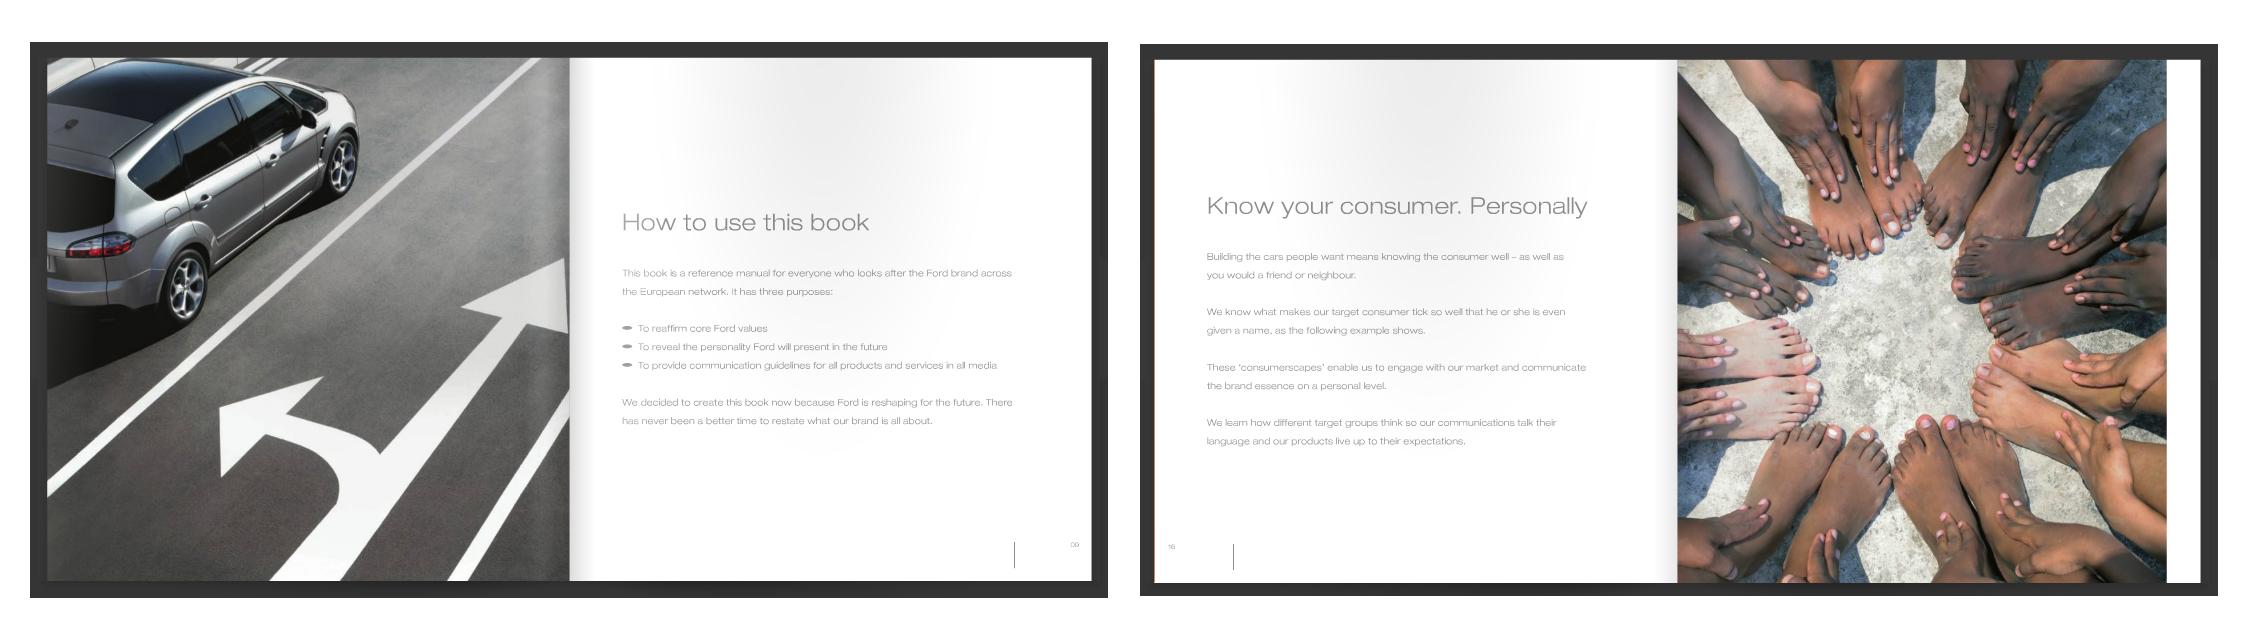 Разработка брендбука компании